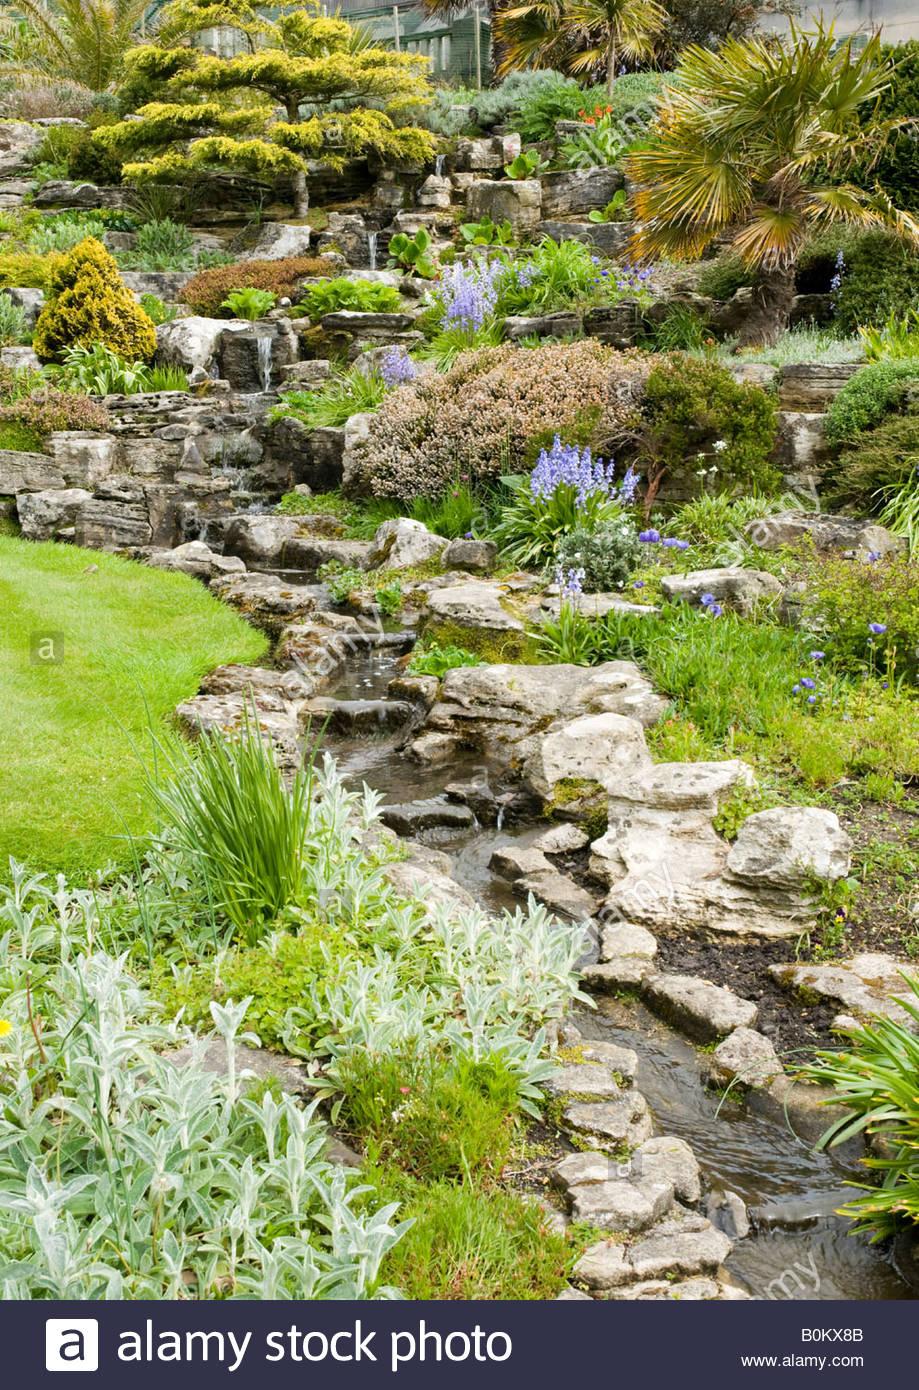 Rock Garden And Waterfall In Bournemouth Gardens Dorset